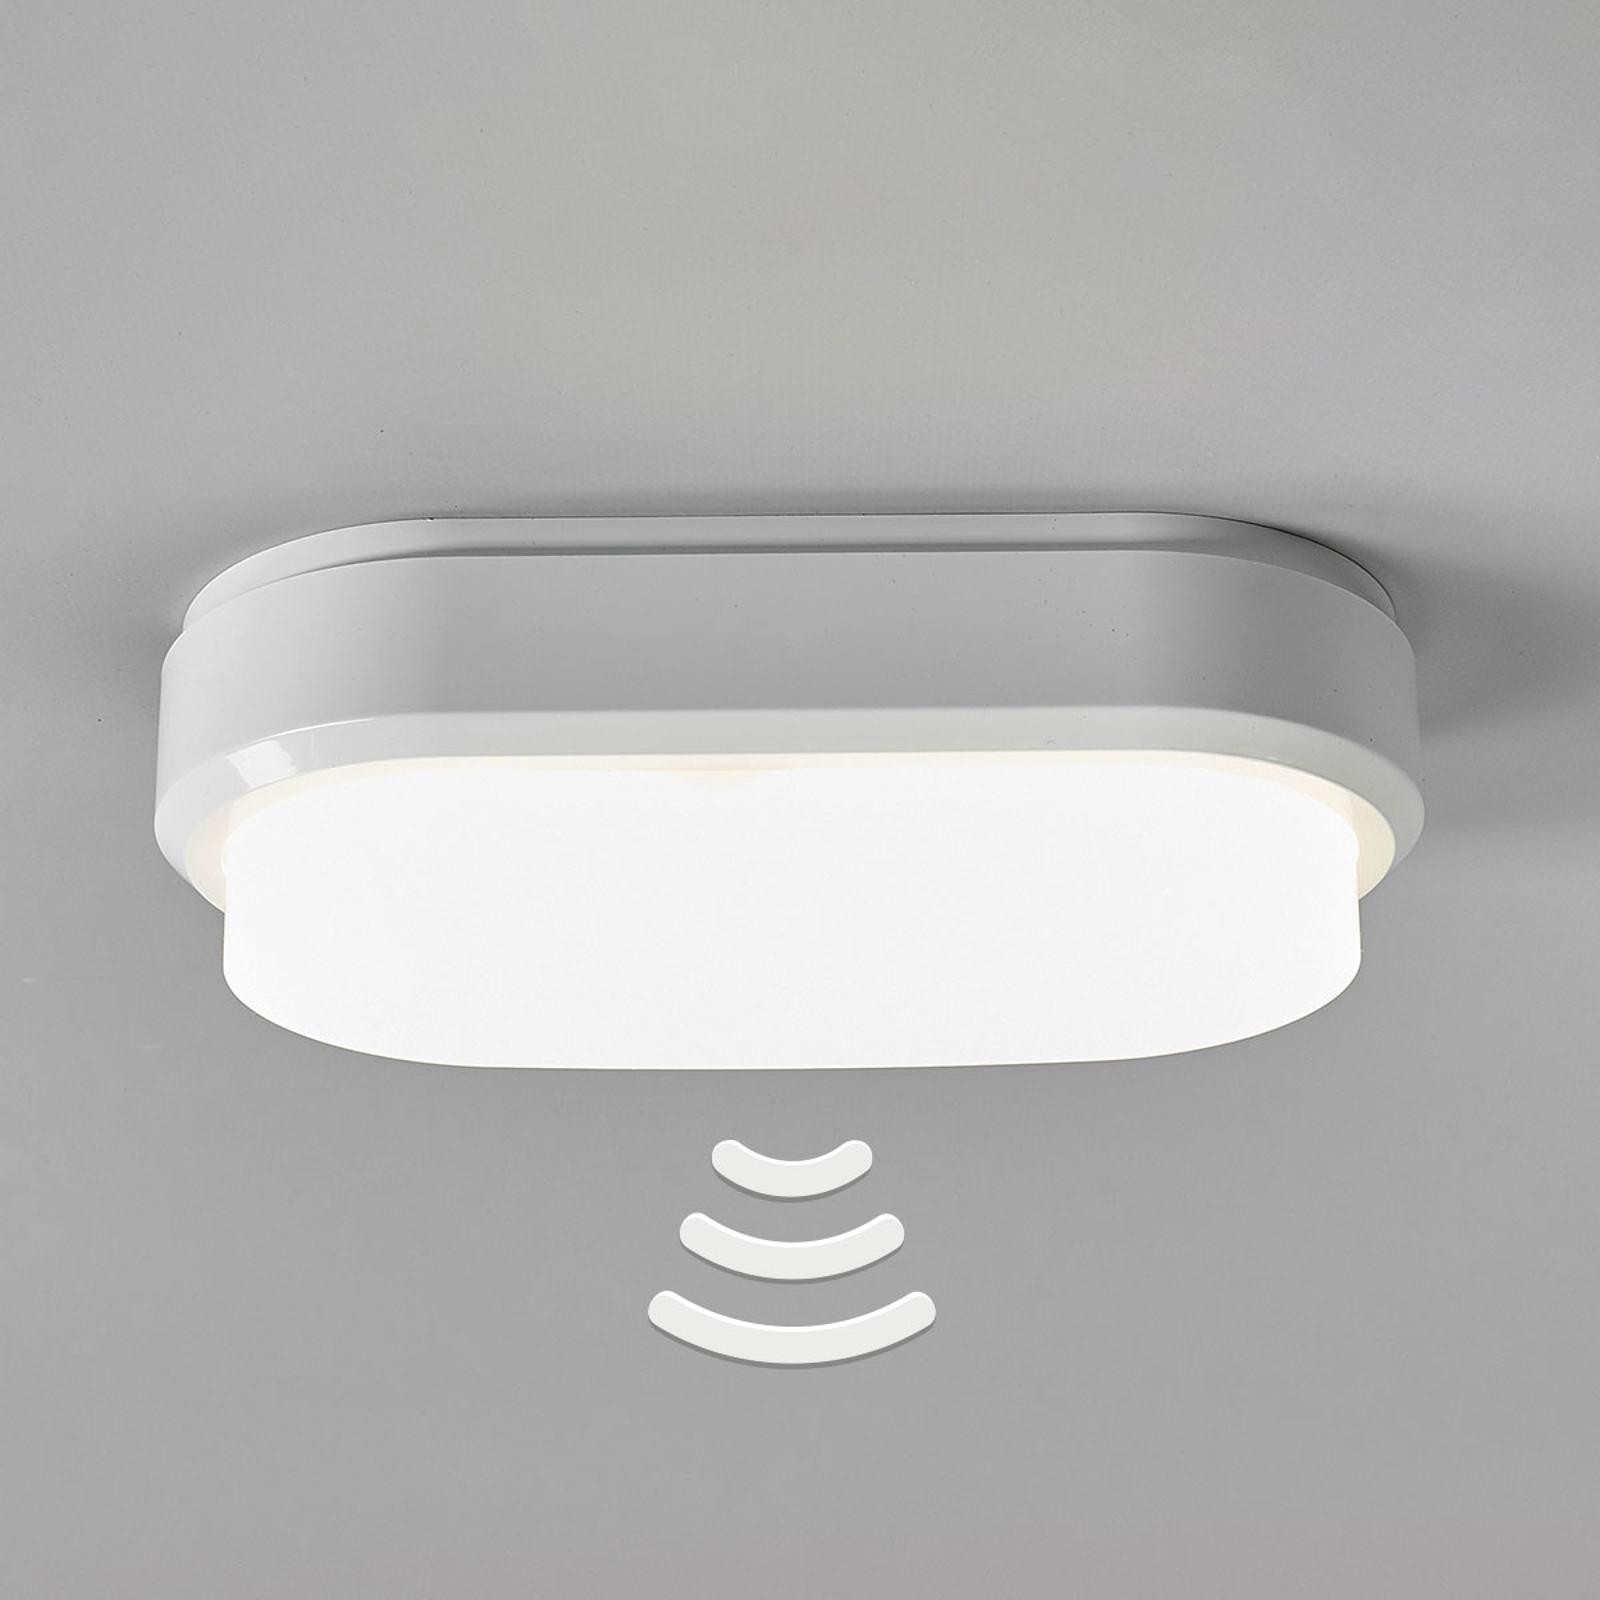 Bulkhead - ovalen LED plafondlamp met sensor